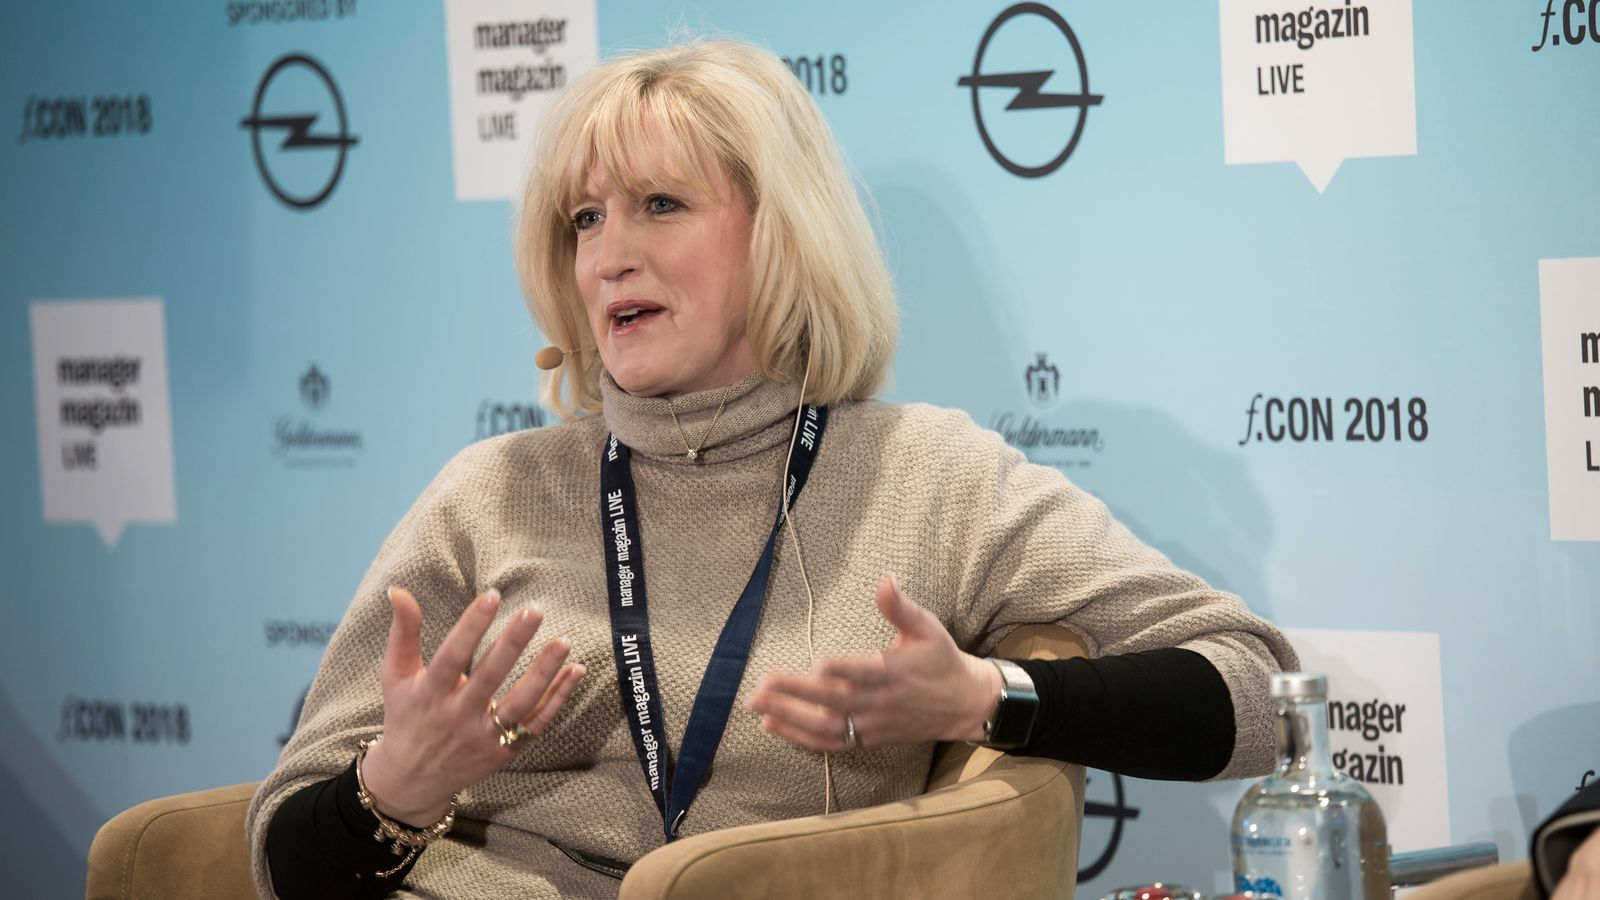 Julie Linn Teigland / fcon 2018